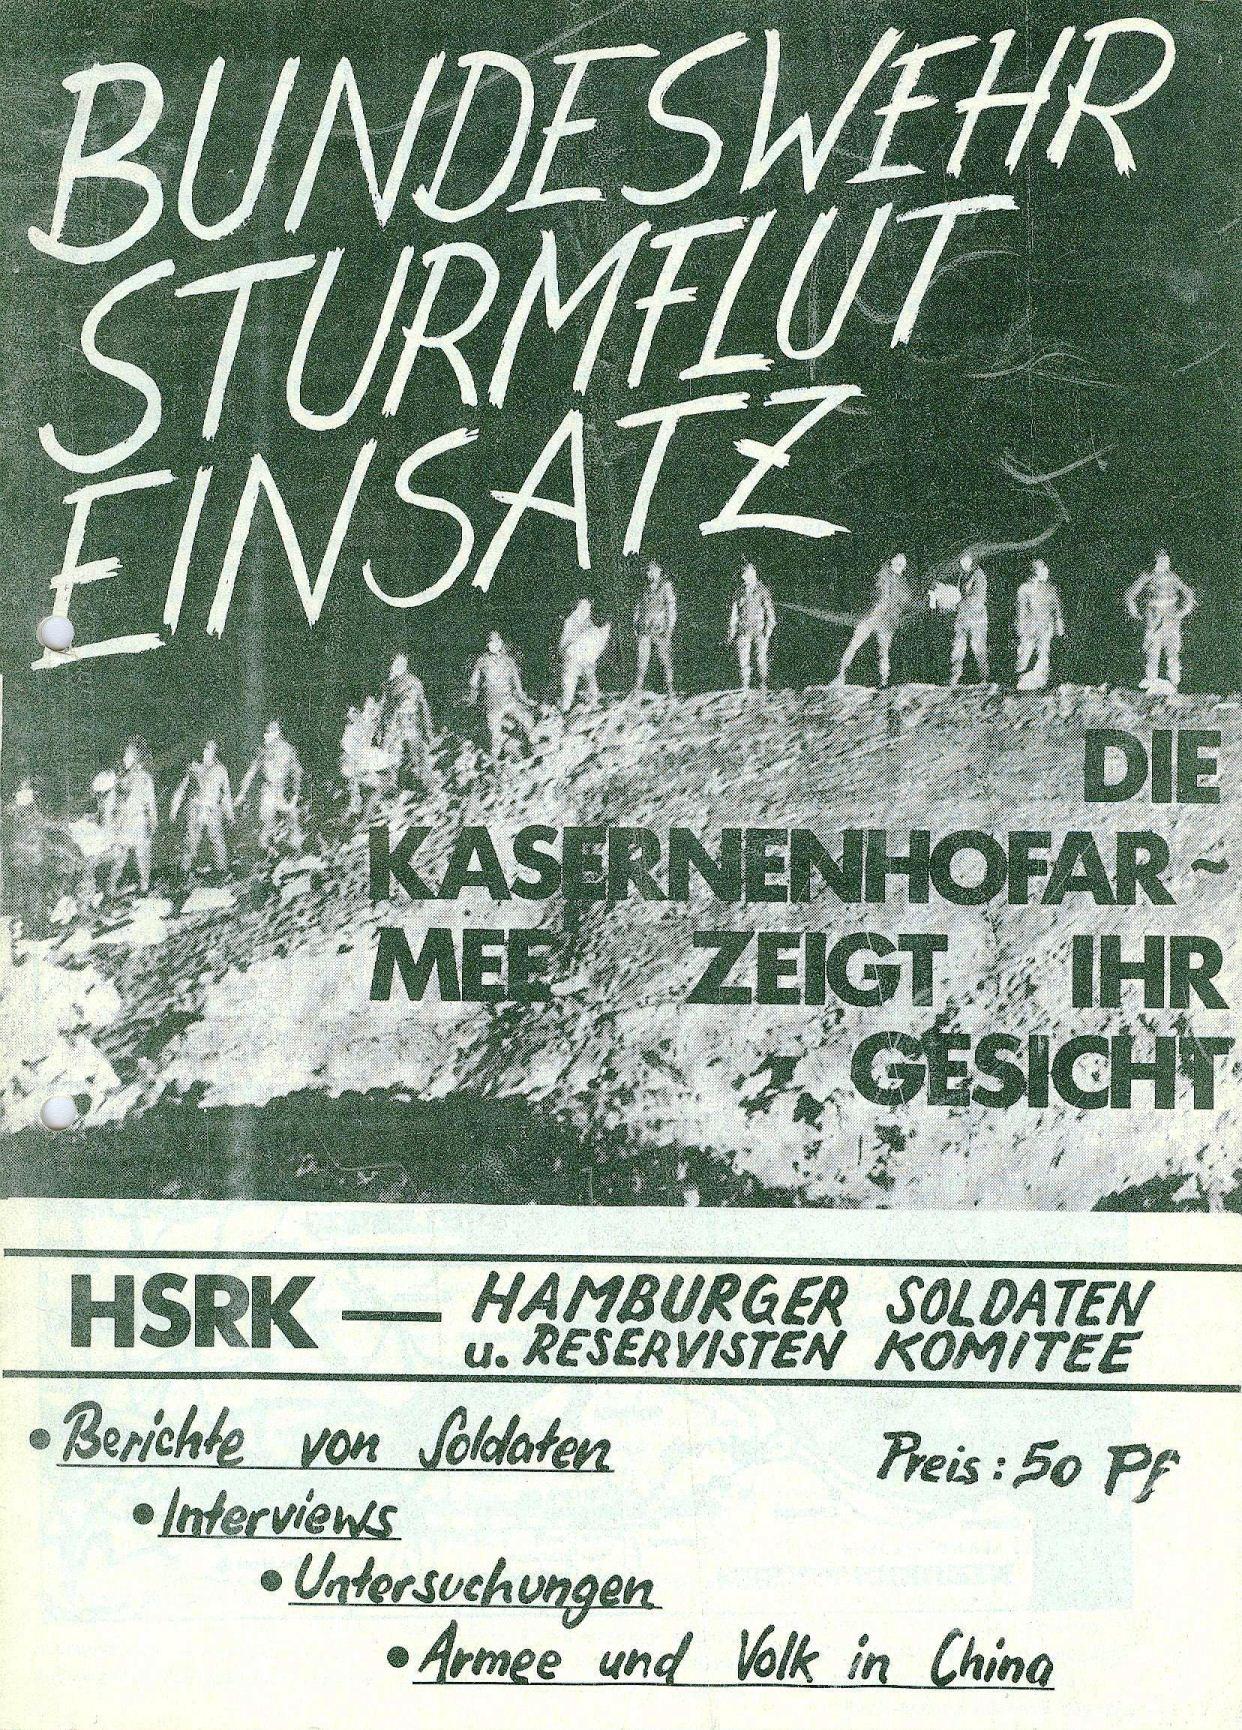 Hamburg_SRK185